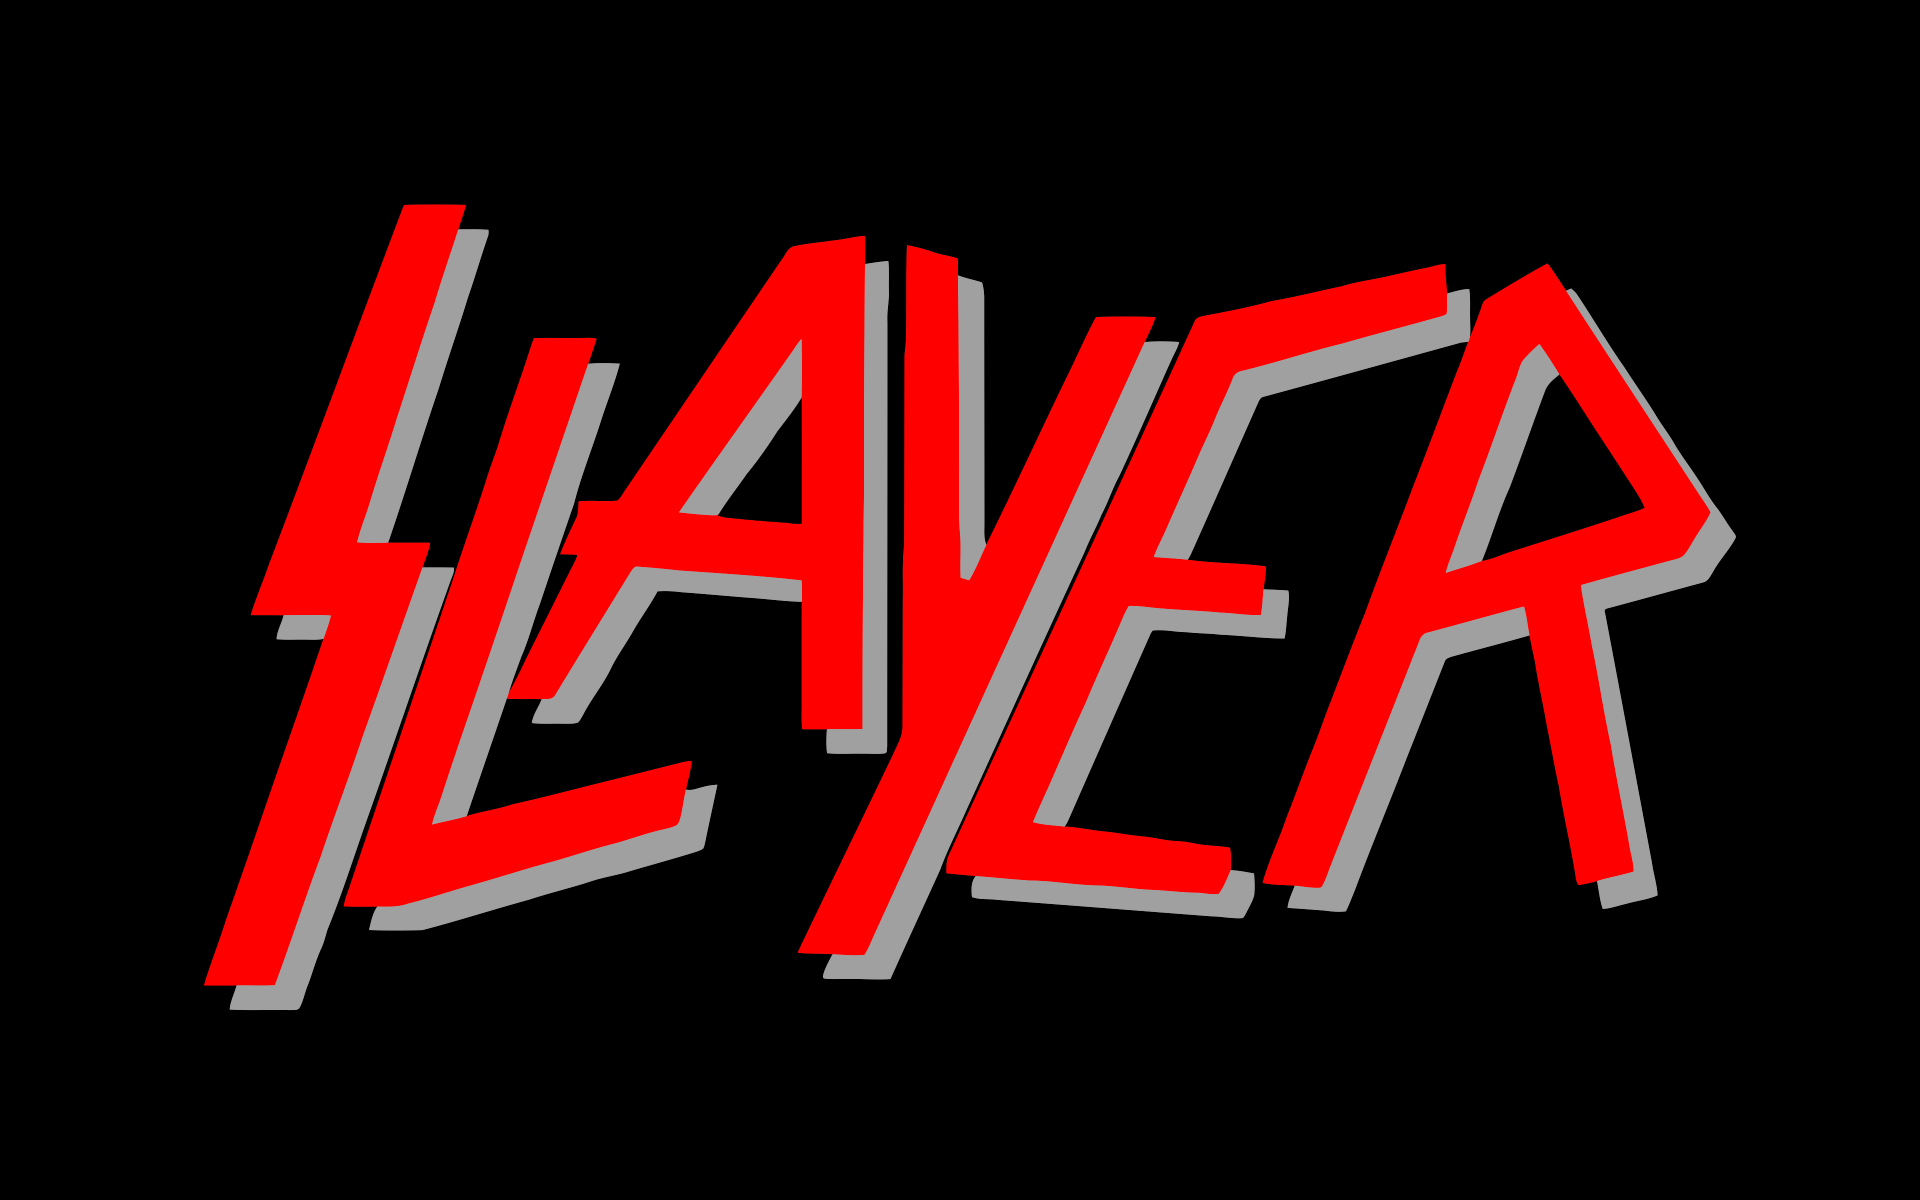 slayer Wallpaper Background 36756 1920x1200